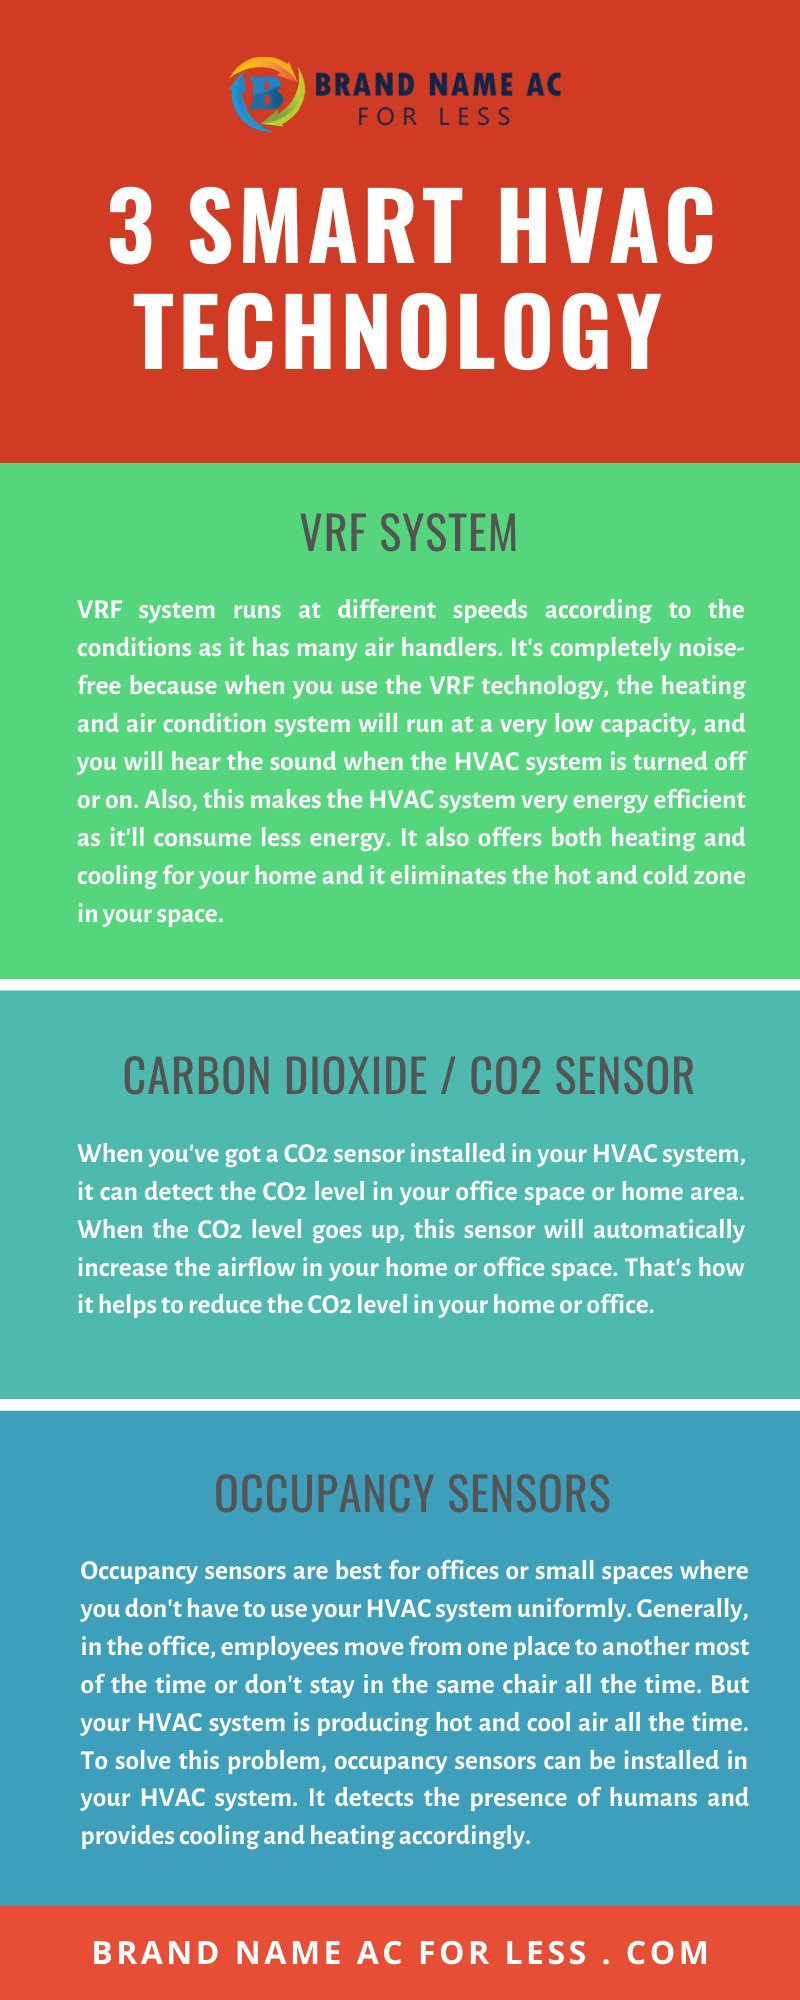 3 Smart HVAC Technology